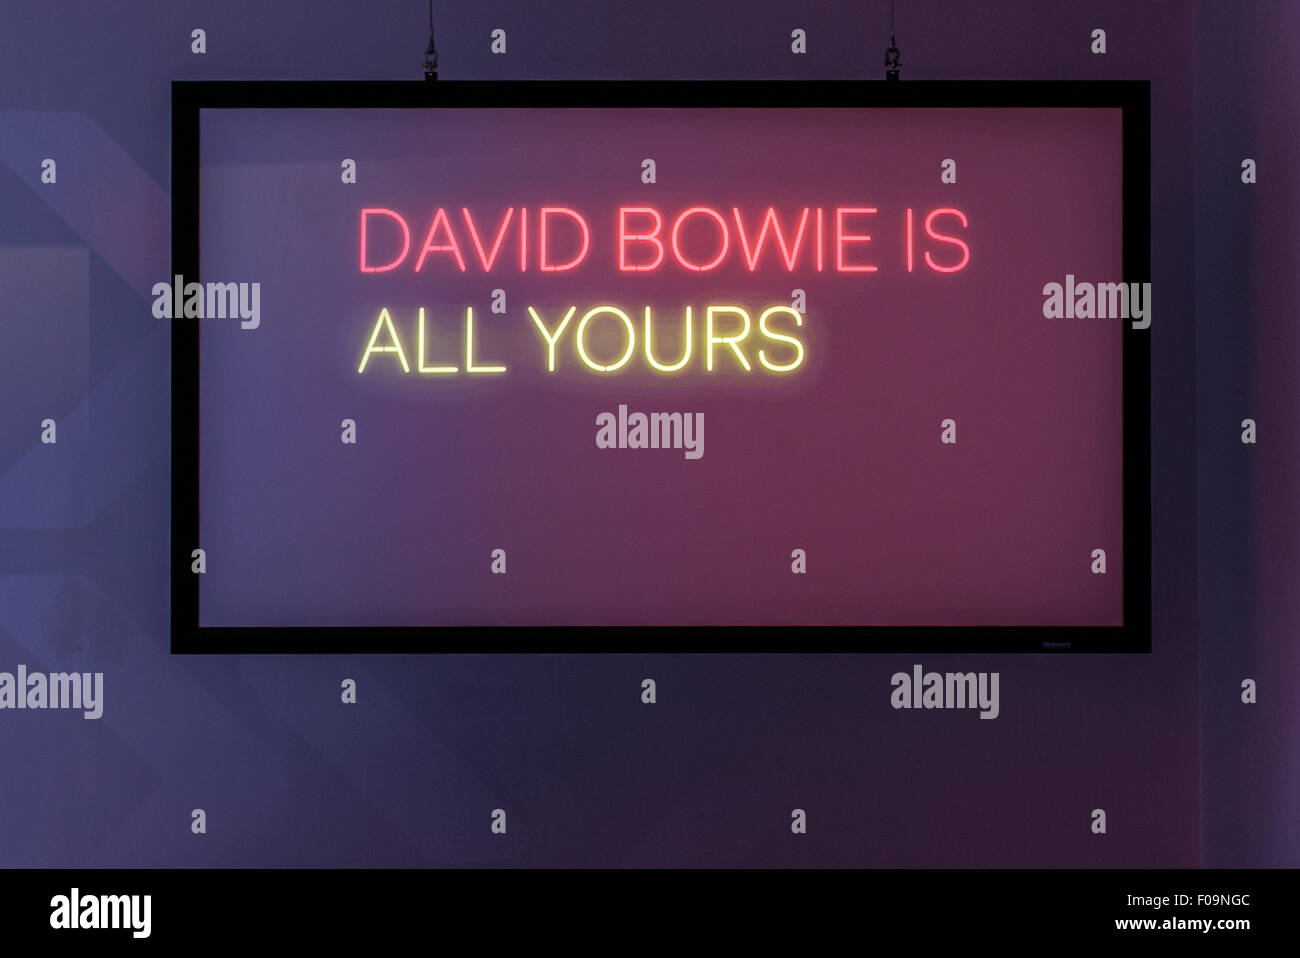 V & A David Bowie ist Ausstellung im ACMI, Melbourne, Australien Stockbild